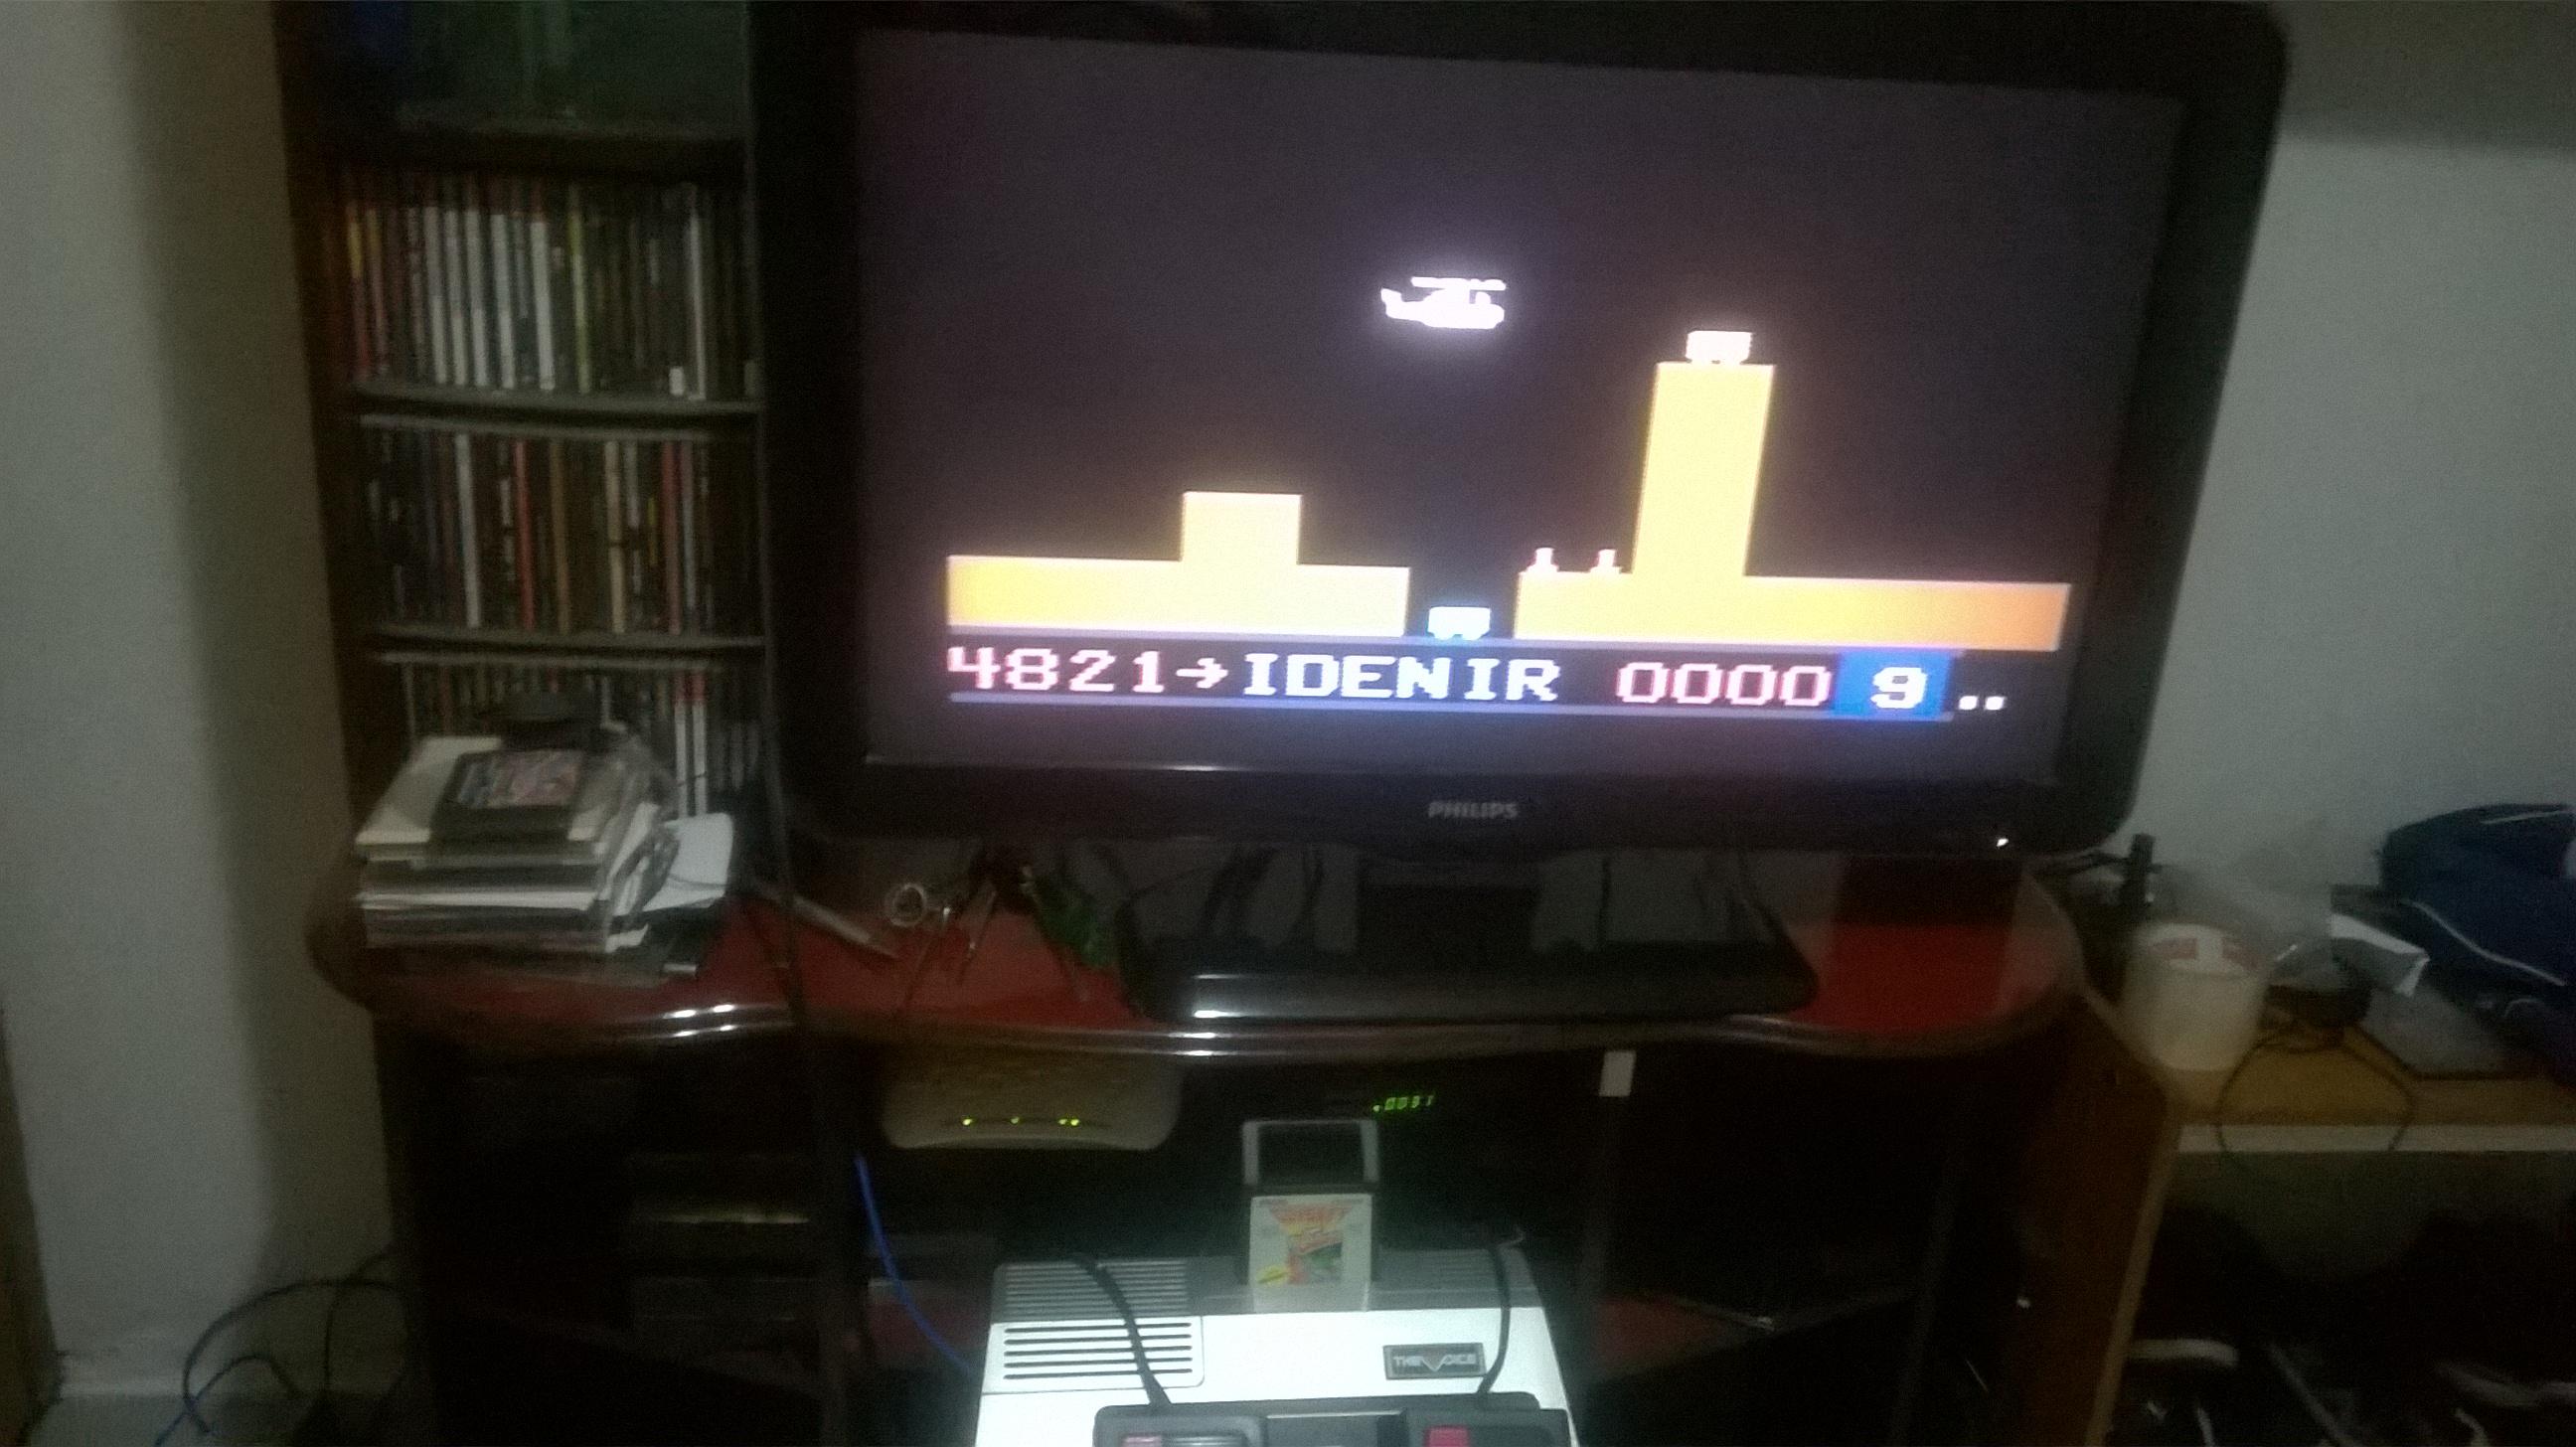 idenir: Super Cobra (Odyssey 2 / Videopac) 4,821 points on 2017-03-08 21:31:40